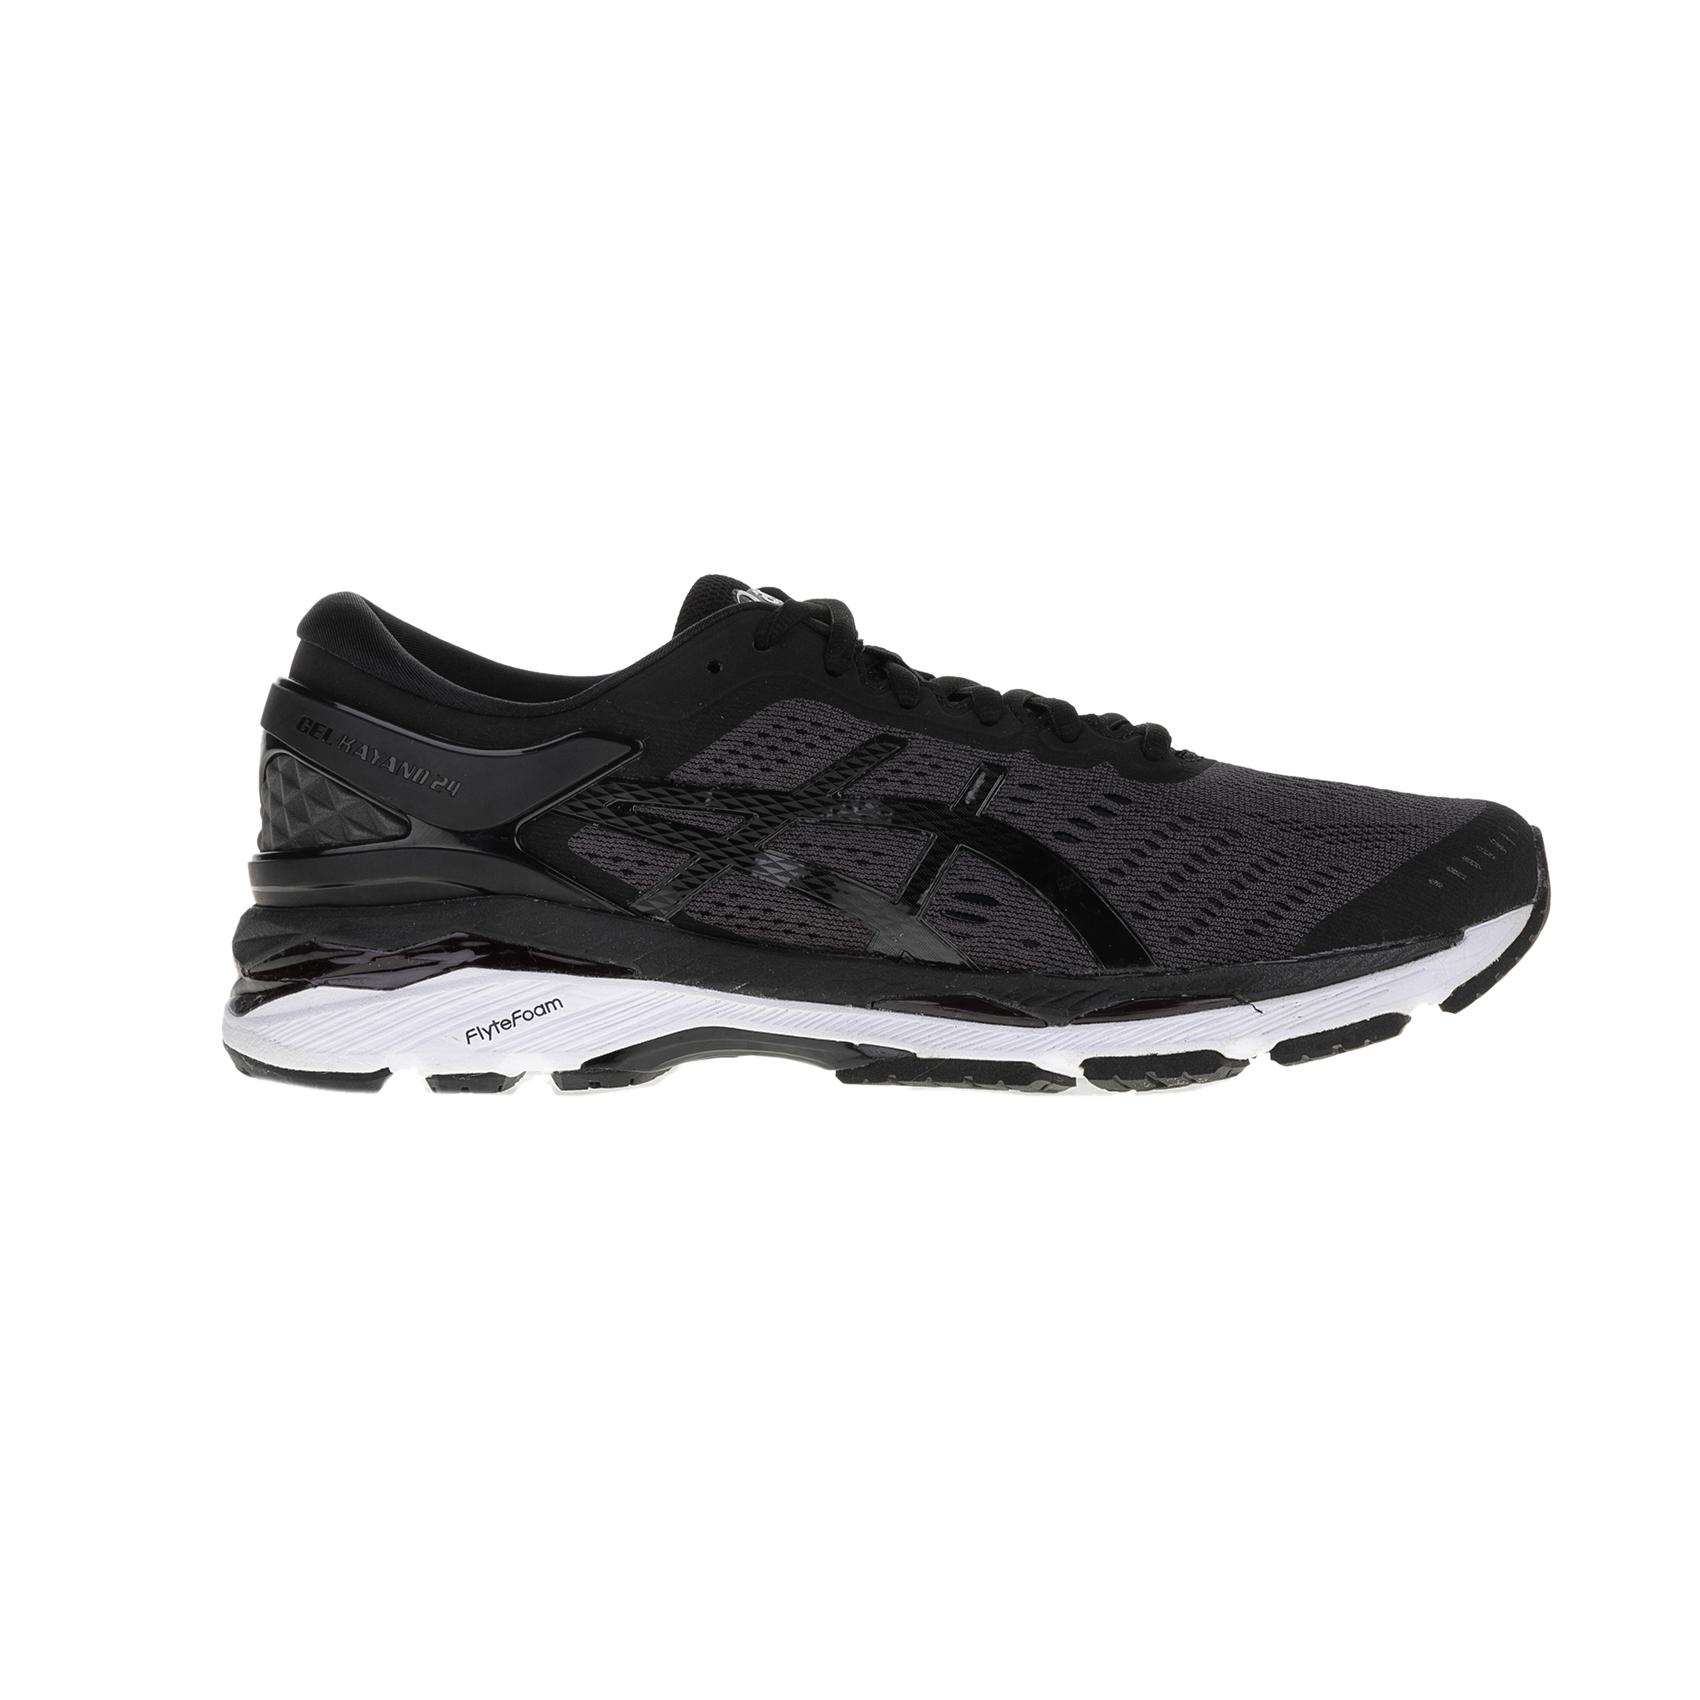 ASICS – Ανδρικά αθλητικά παπούτσια ASICS GEL-KAYANO 24 μαύρα